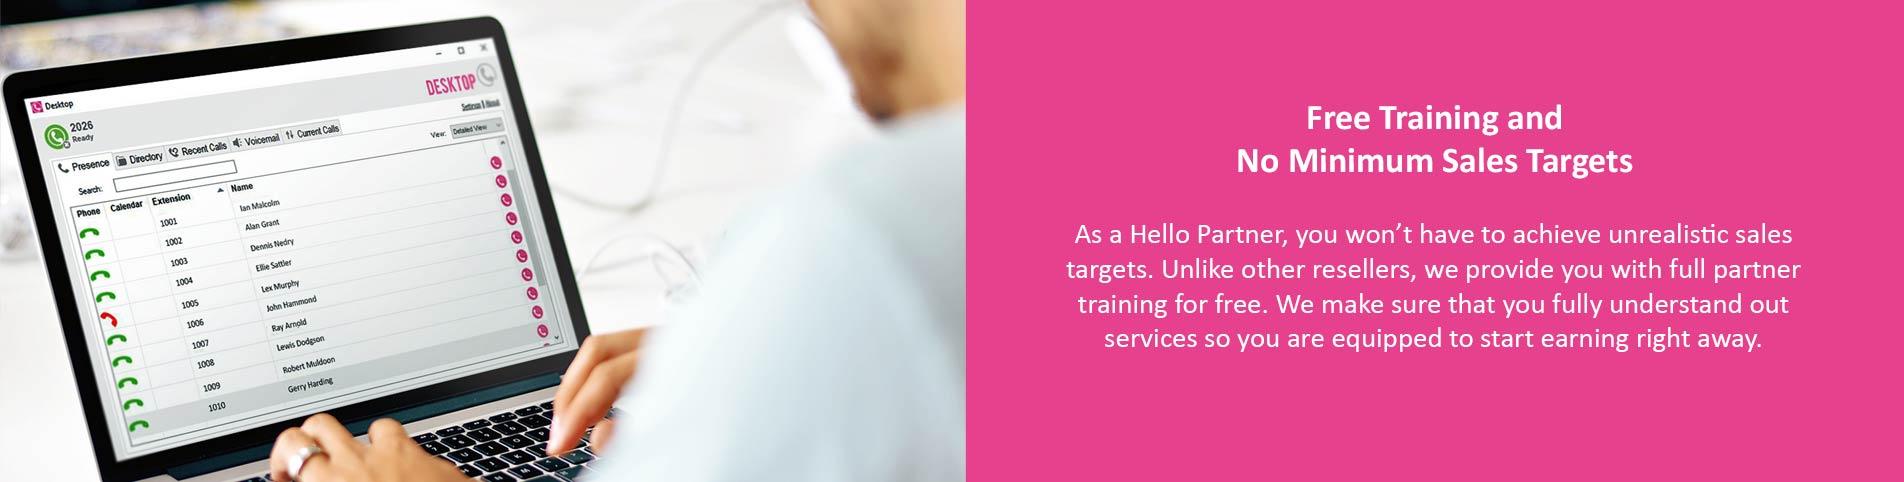 Hello Telecom free Partner training